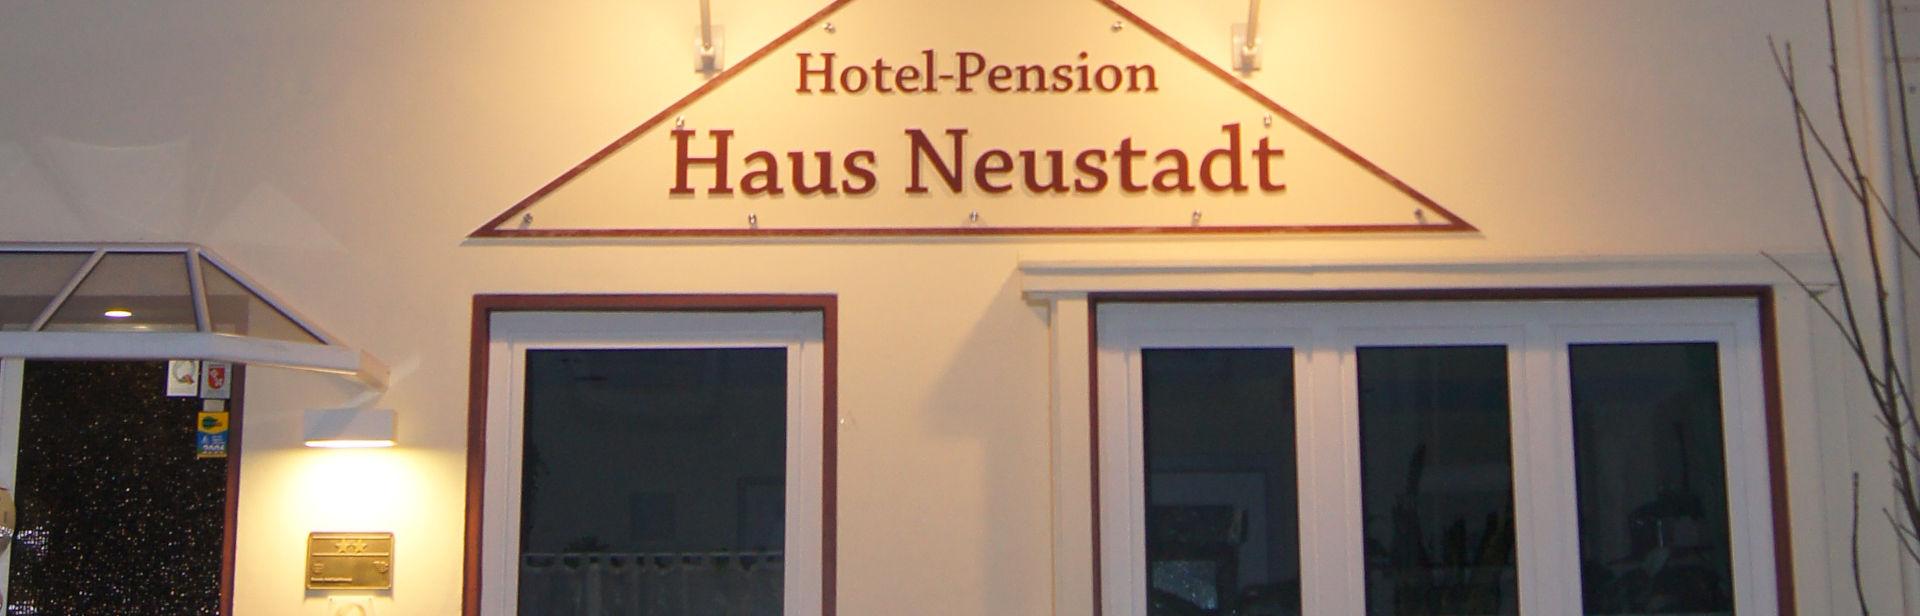 Hotel Pension Haus Neustadt in Bremen